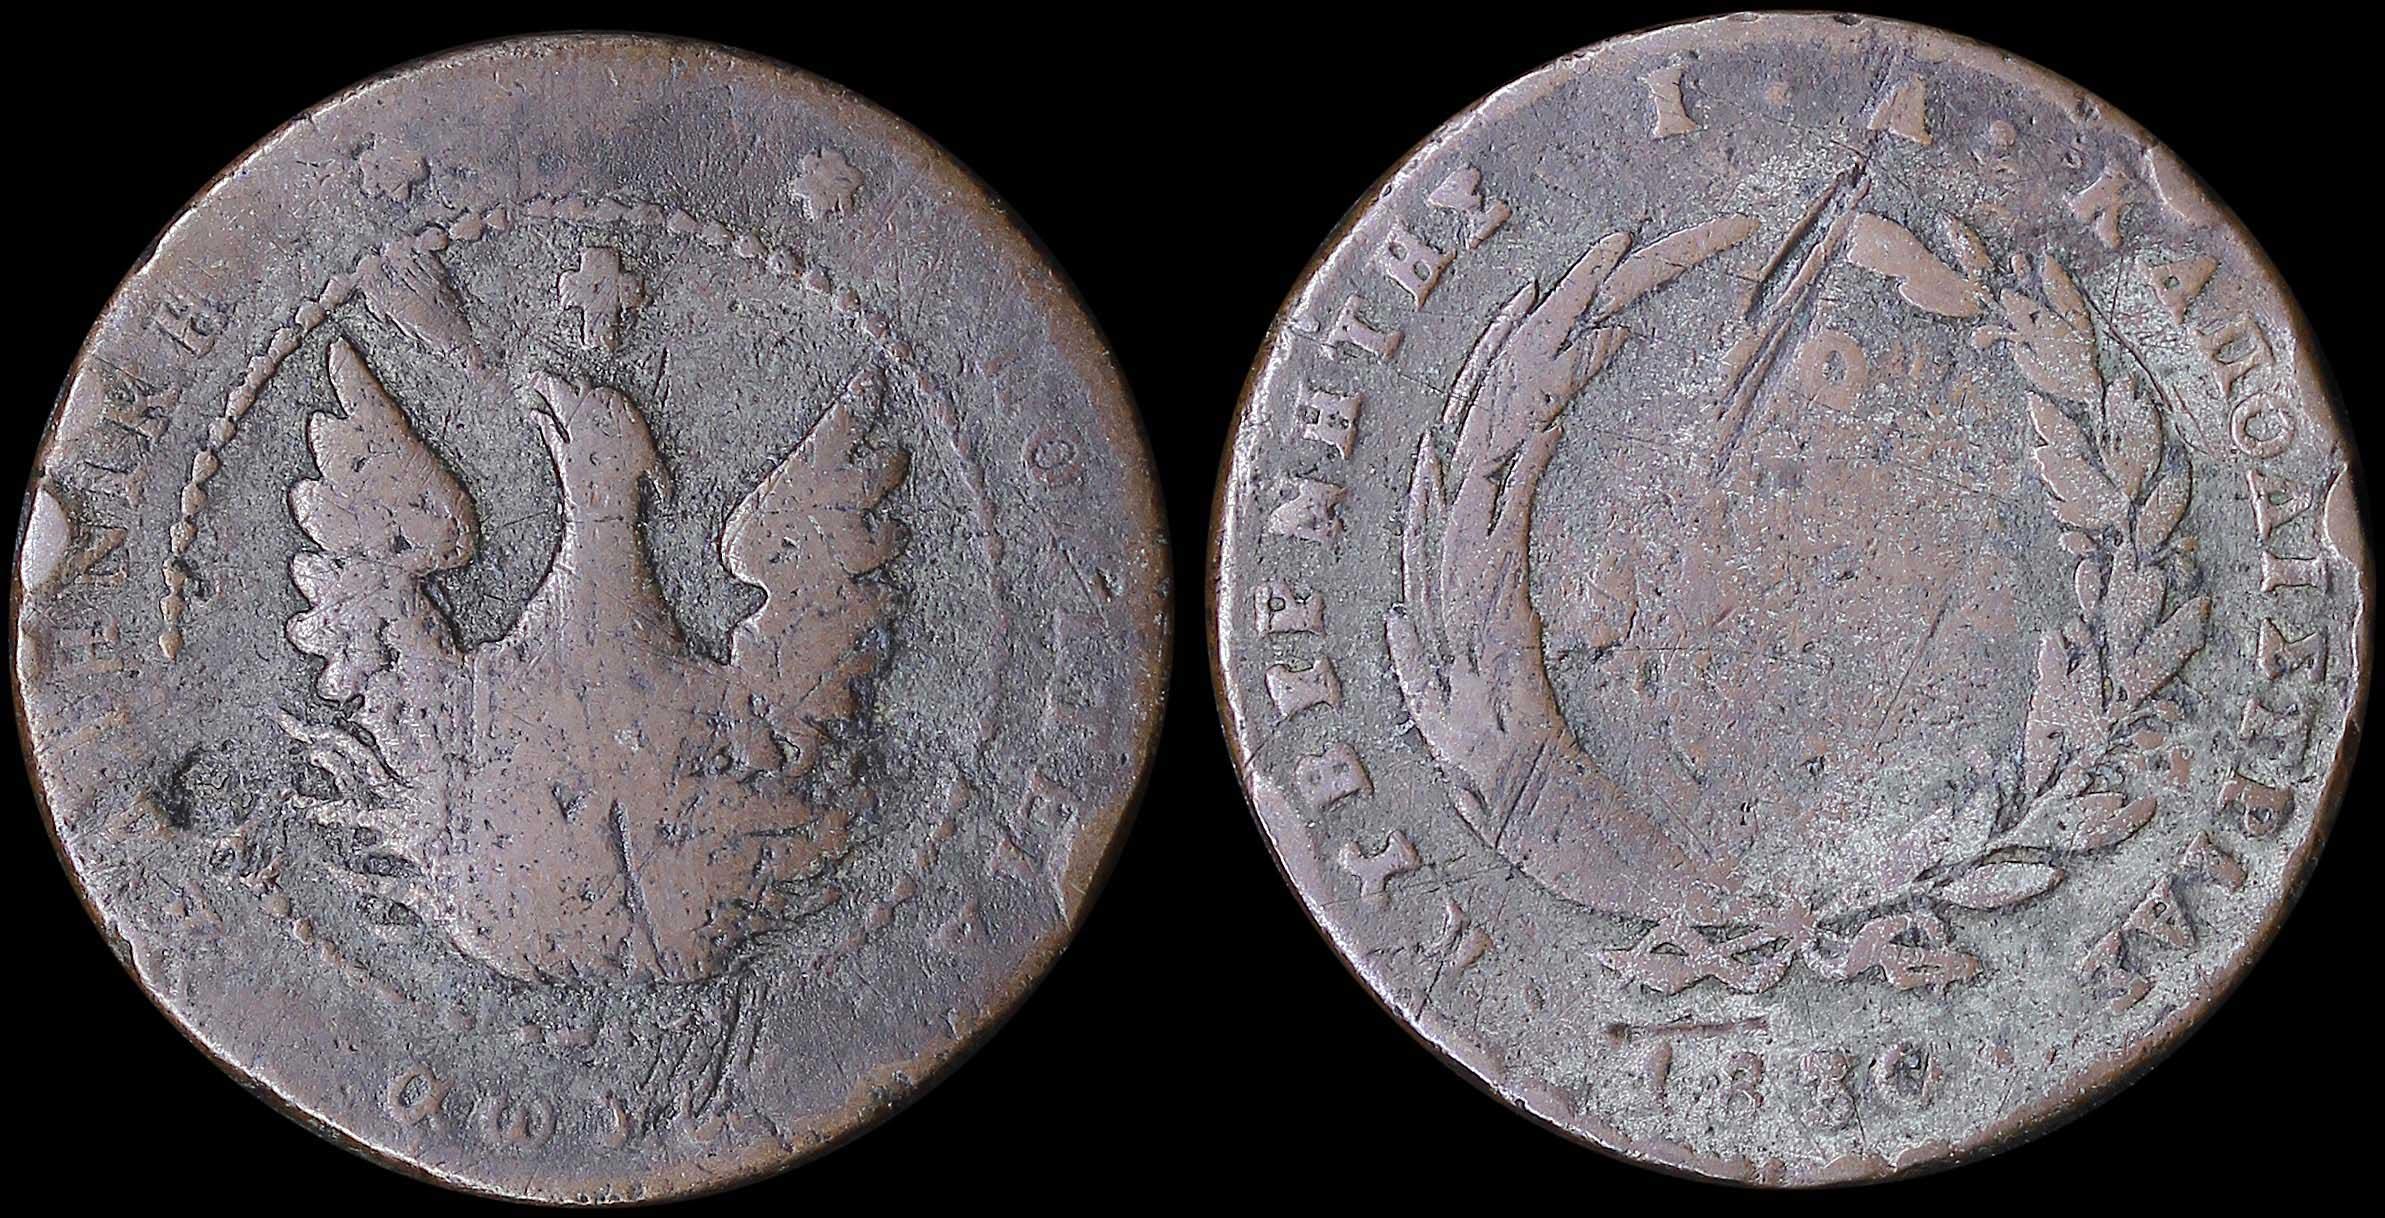 Lot 6019 - -  COINS & TOKENS governor capodistrias -  A. Karamitsos Public & Live Internet Auction 665 Coins, Medals & Banknotes